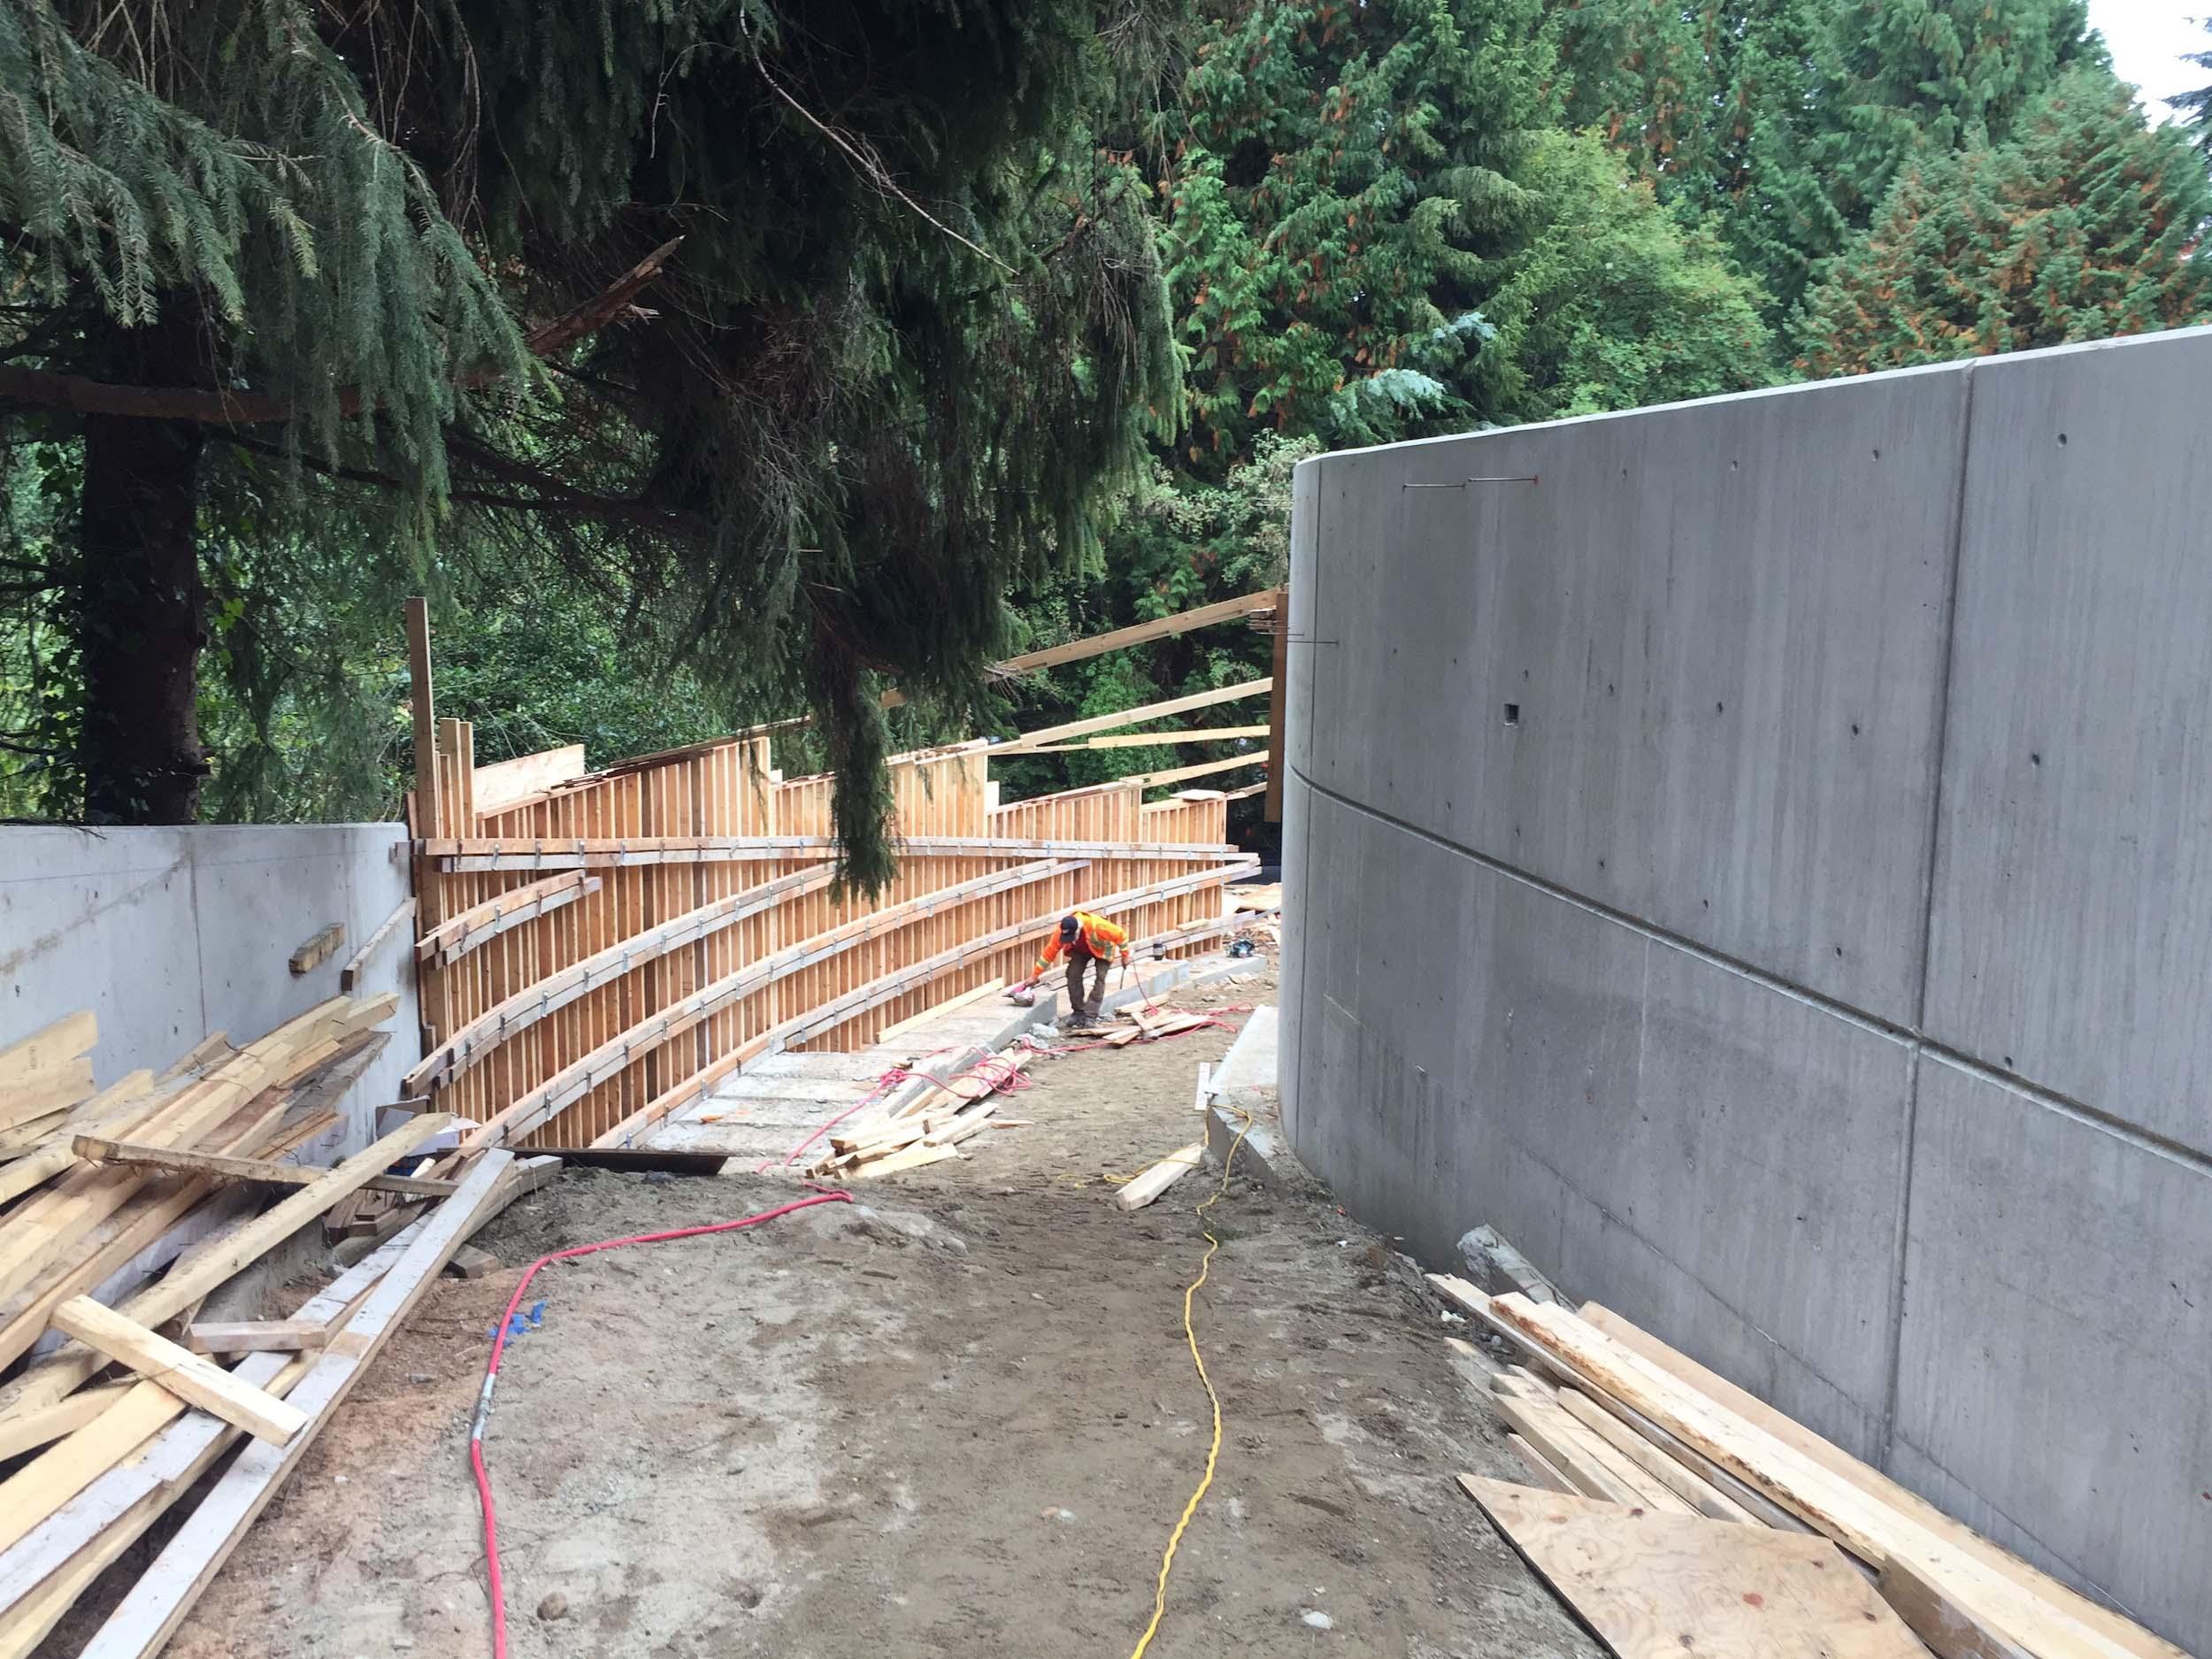 Postle_Construction_ConcreteForming12.jpg